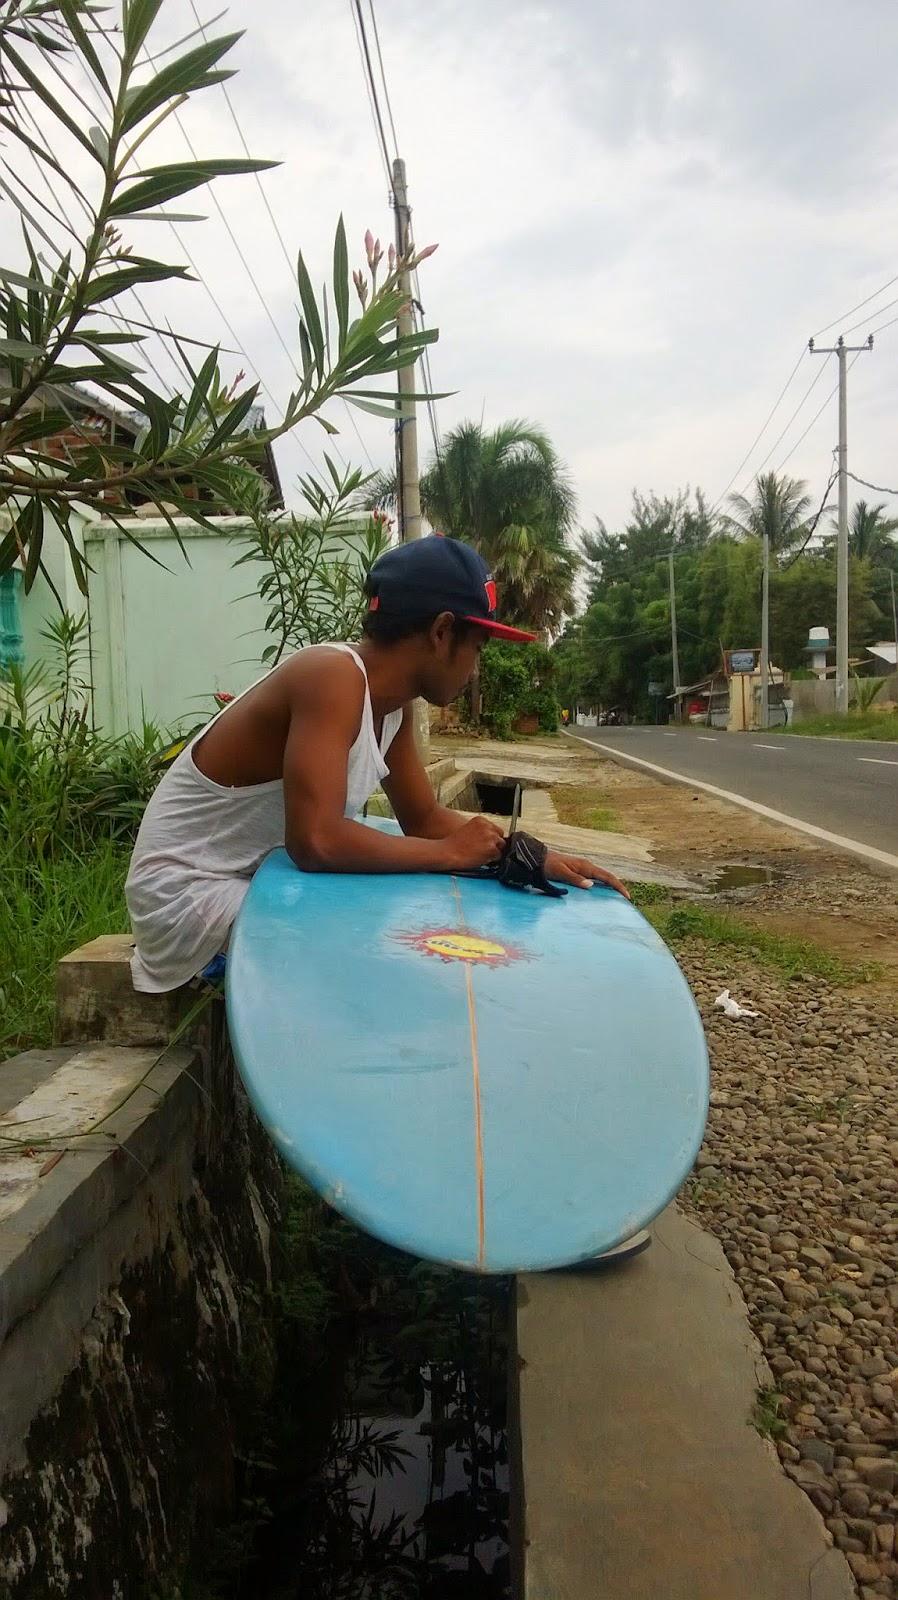 surfing lesson in cimaja jakarta